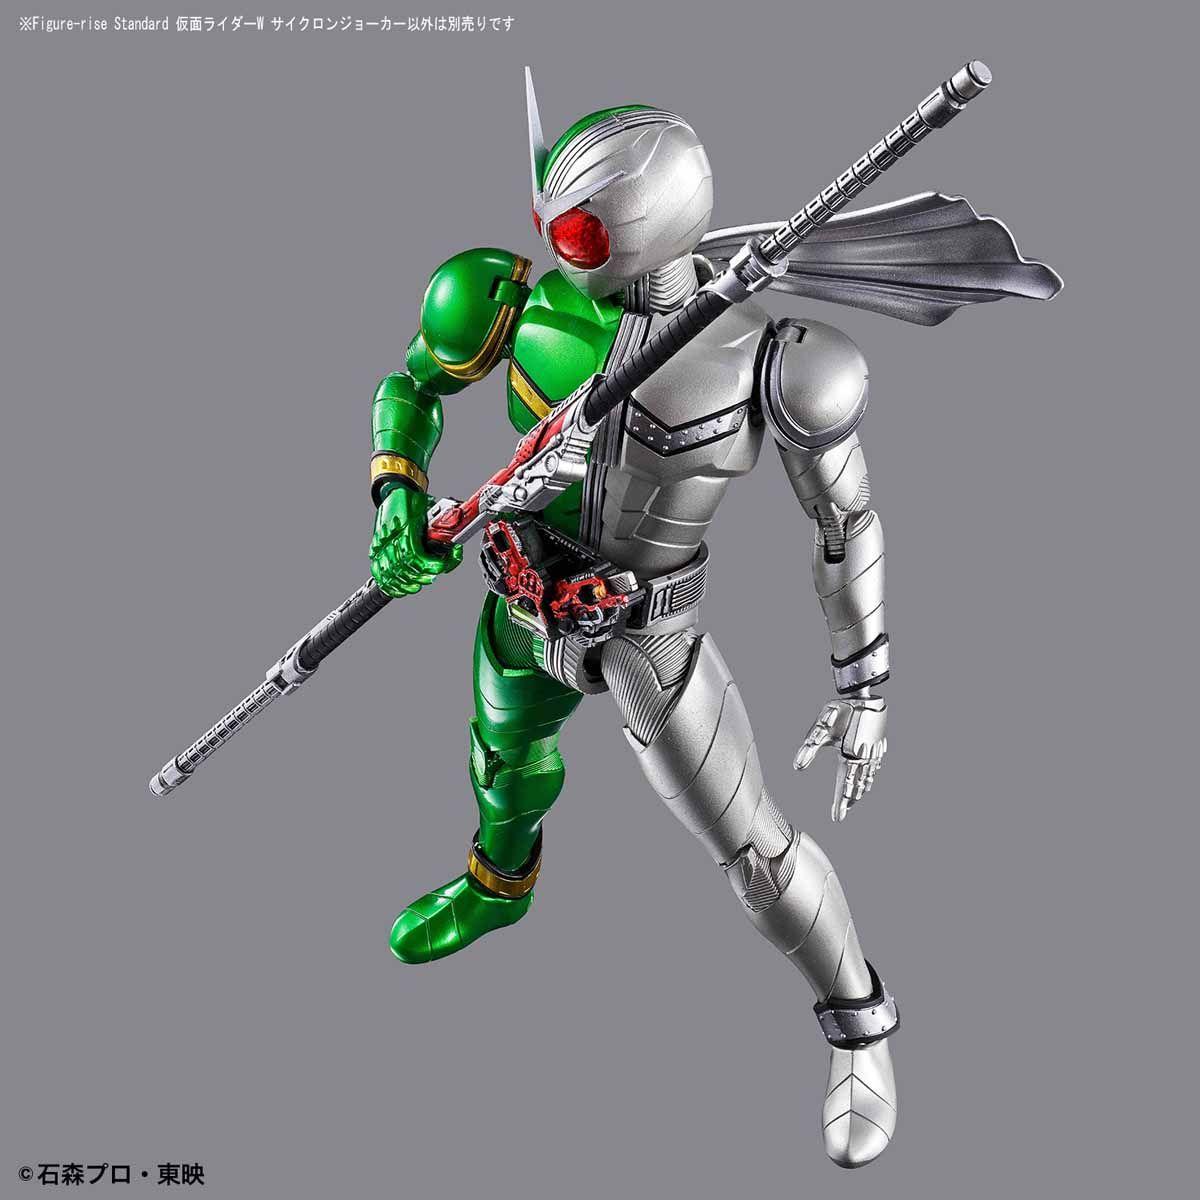 Figure-rise Standard Masked Kamen Rider Cyclone Joker